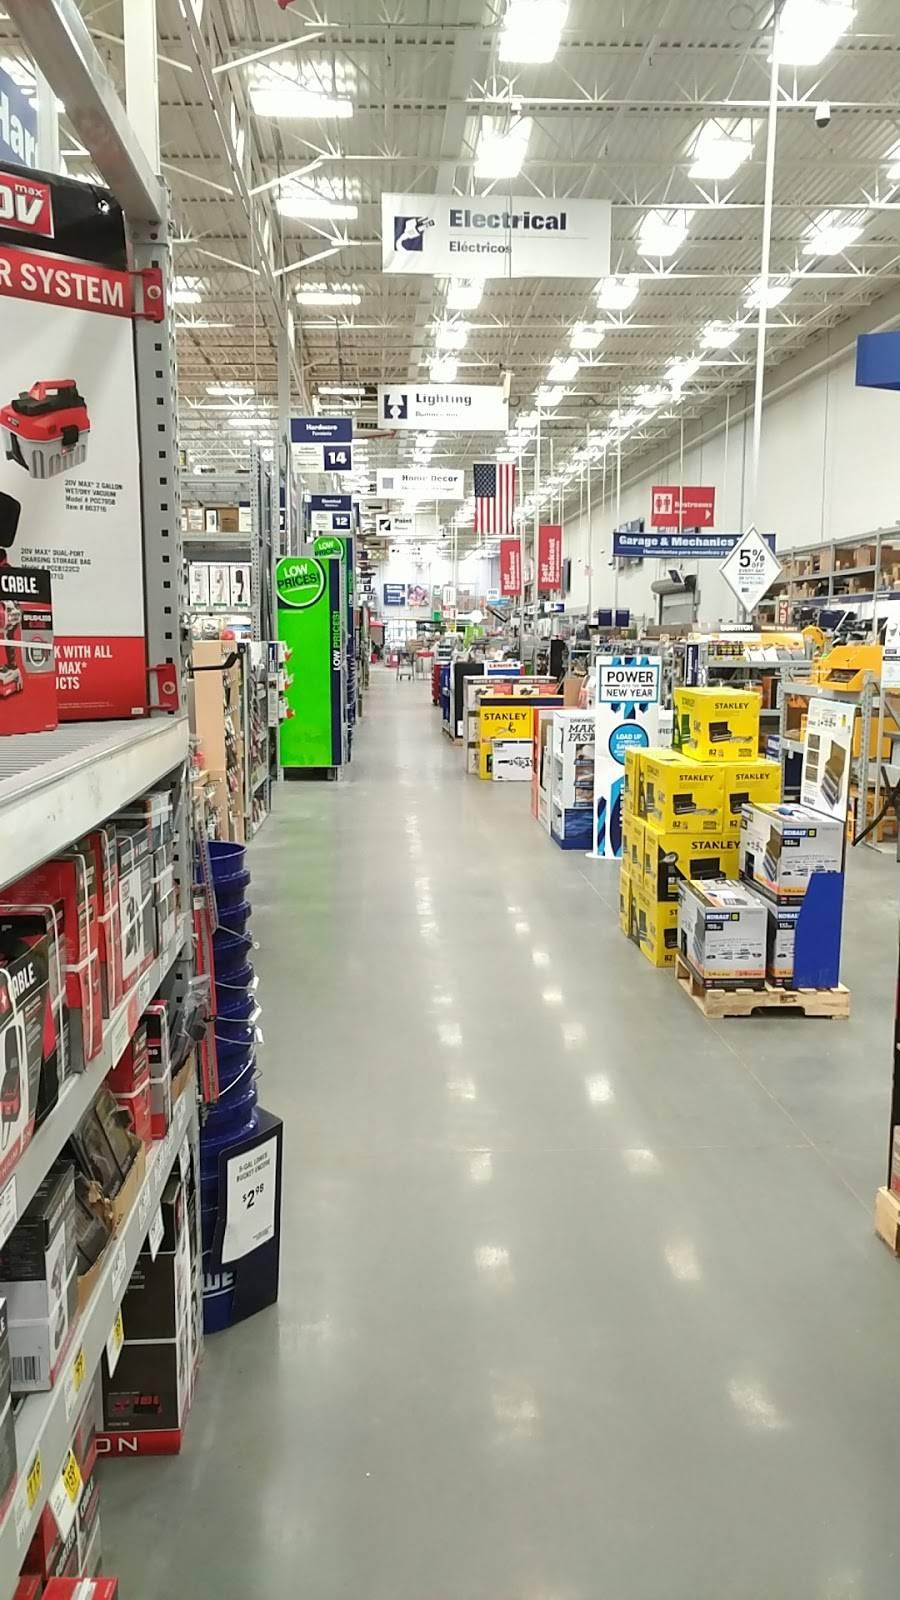 Lowes Home Improvement - hardware store  | Photo 9 of 10 | Address: 6425 Mechanicsville Turnpike, Mechanicsville, VA 23111, USA | Phone: (804) 417-8000